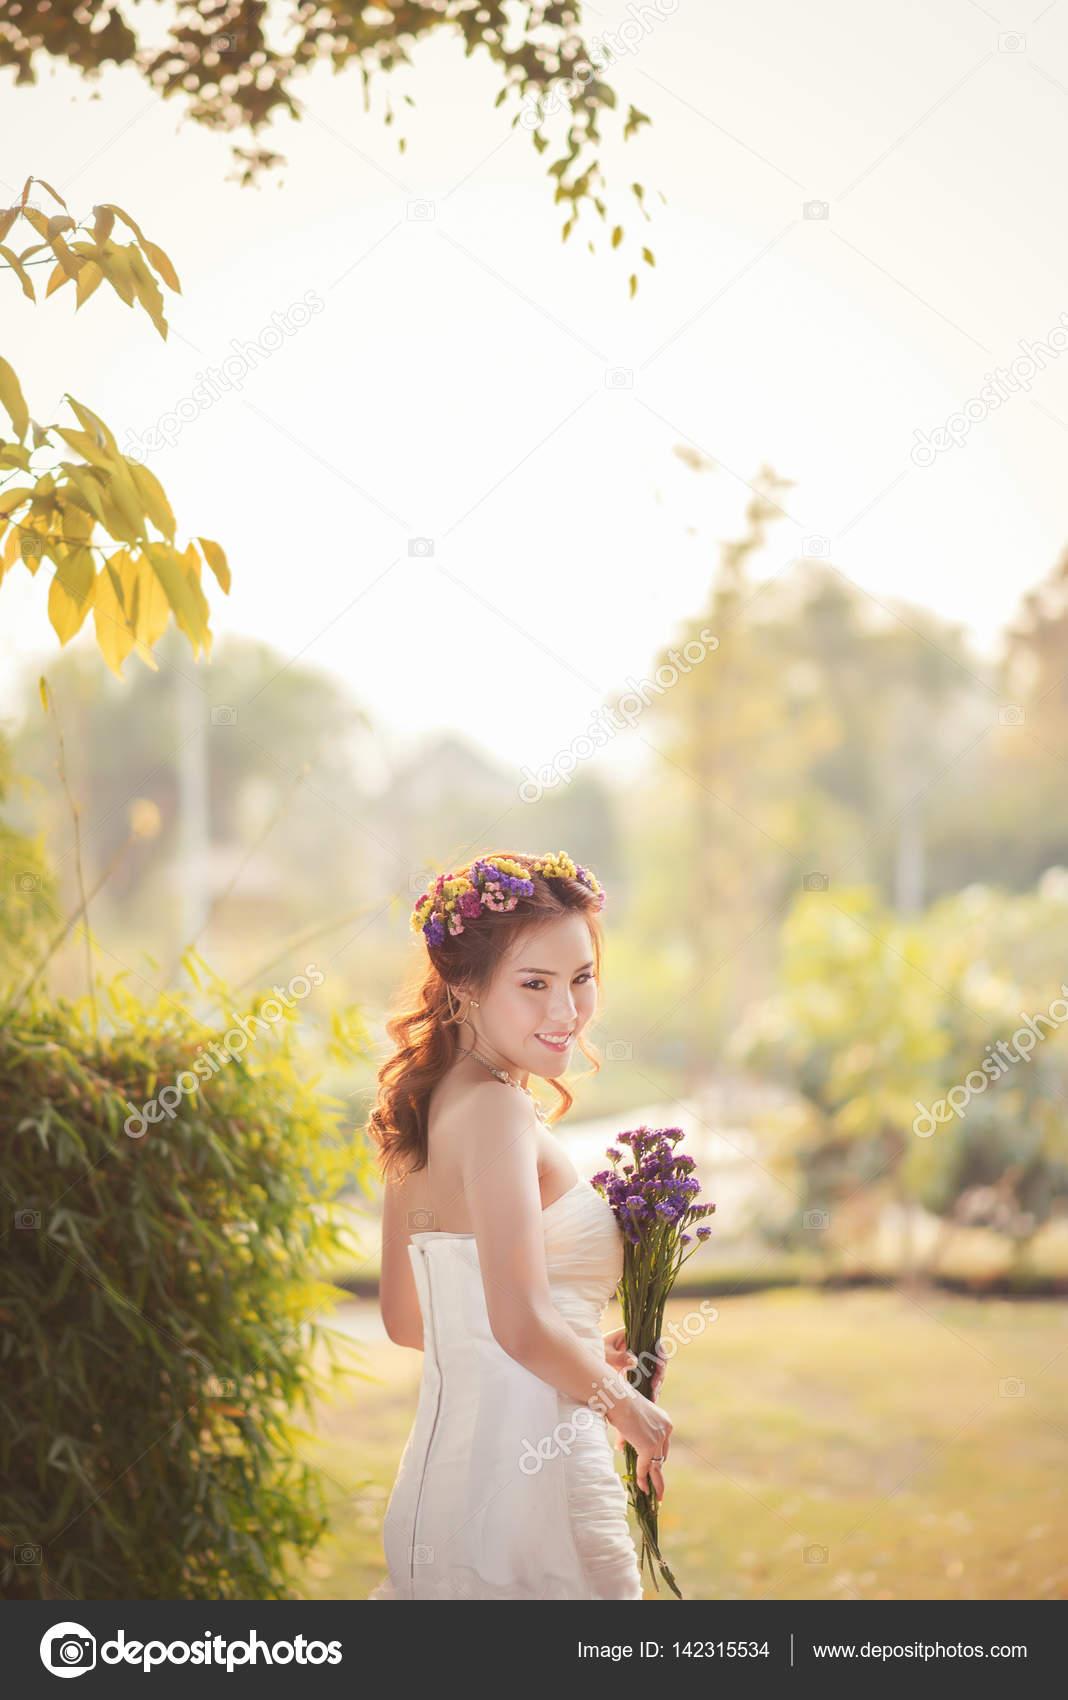 Excellent phrase asian girl wedding dress for